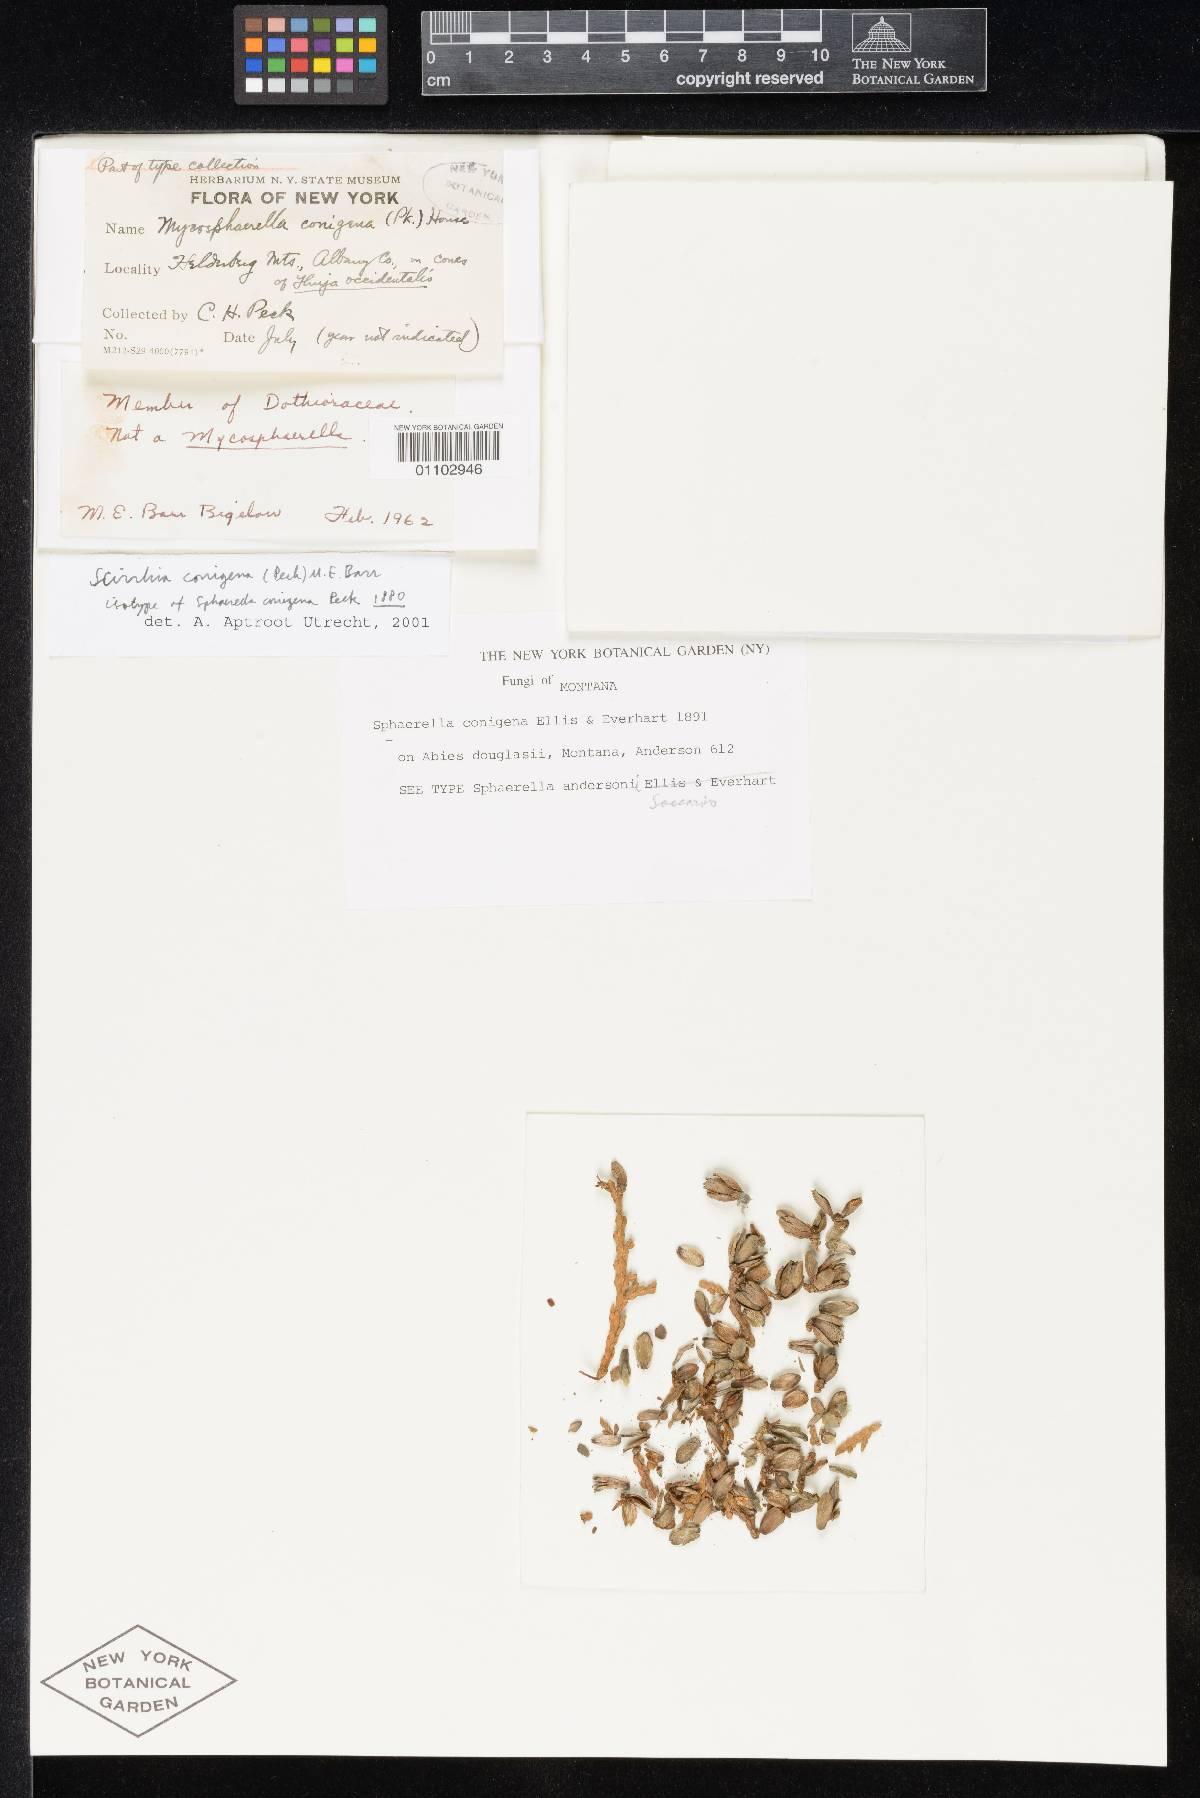 Sphaerella convexula f. caryae-tomentosae image